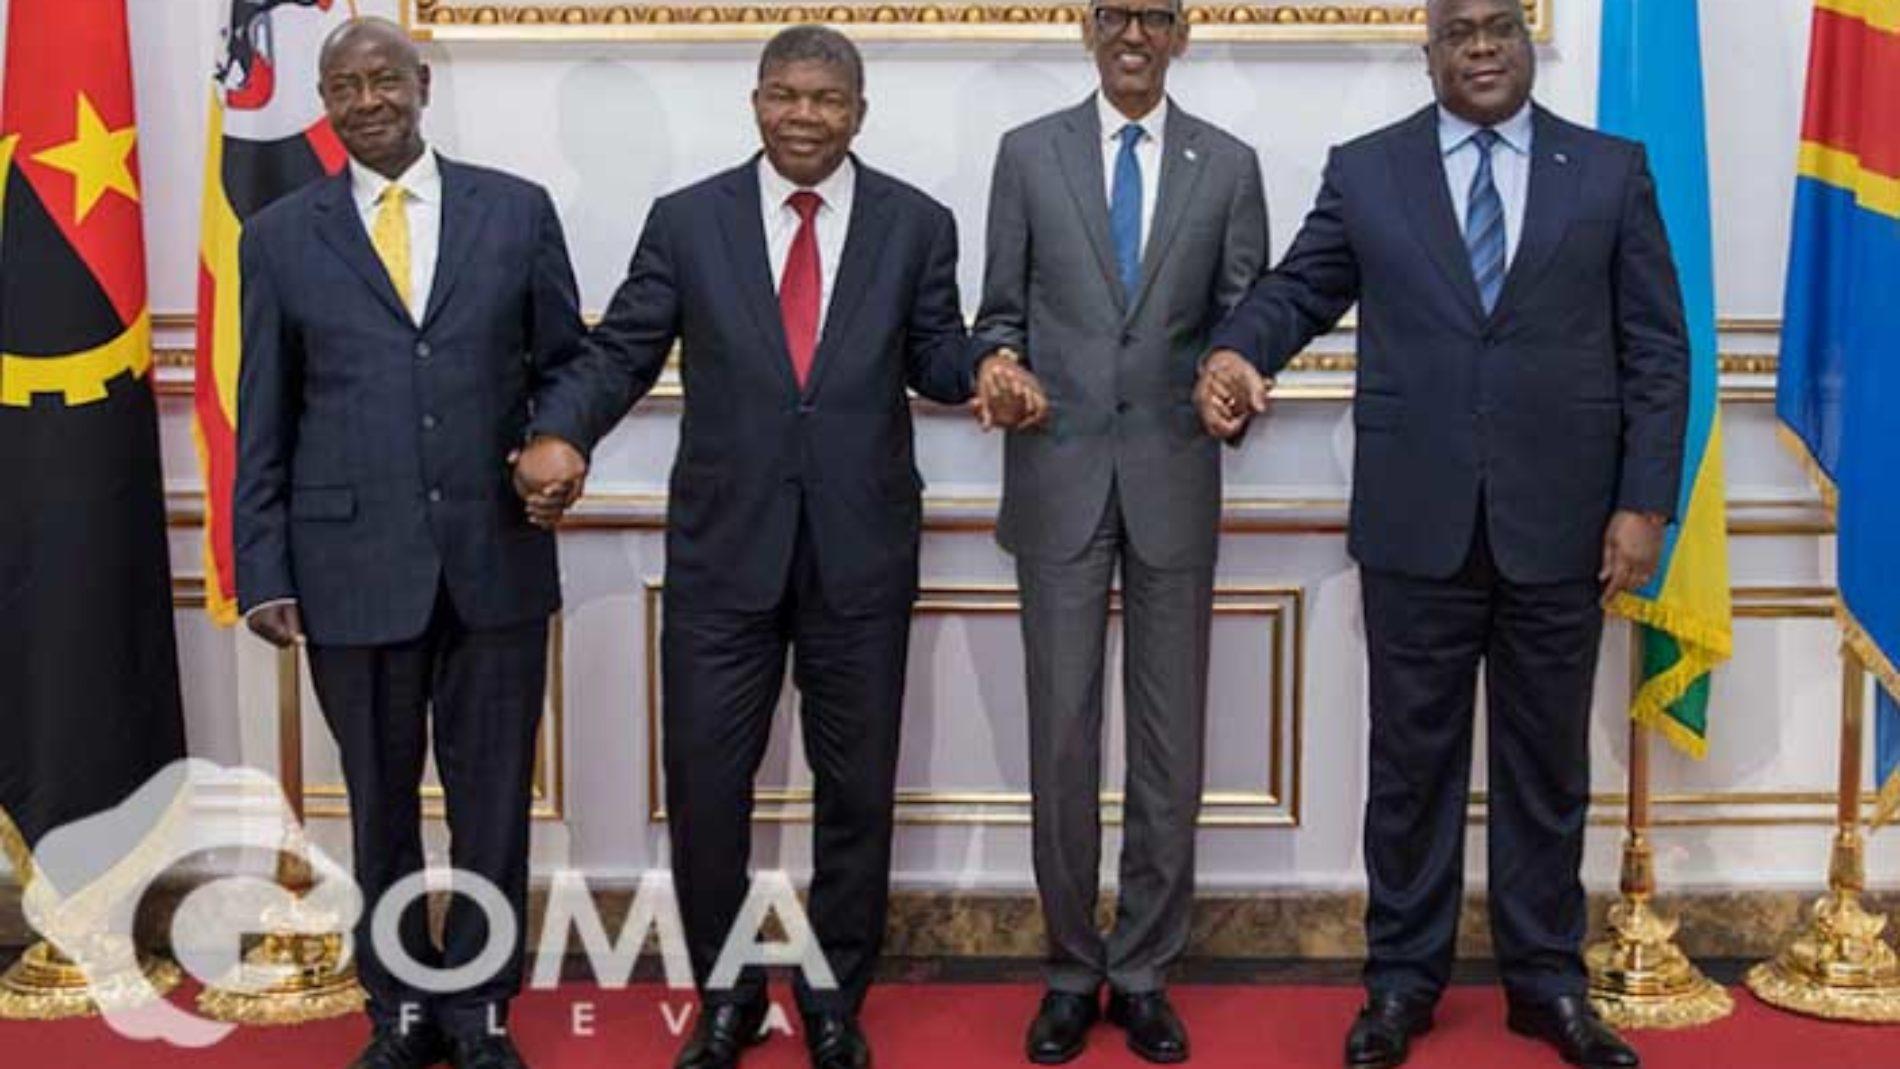 Goma : Félix Tshisekedi confirme la tenue d'une réunion entre Paul Kagame, Yoweri Museveni, Joao Lourenço et Evariste Ndayishimiye